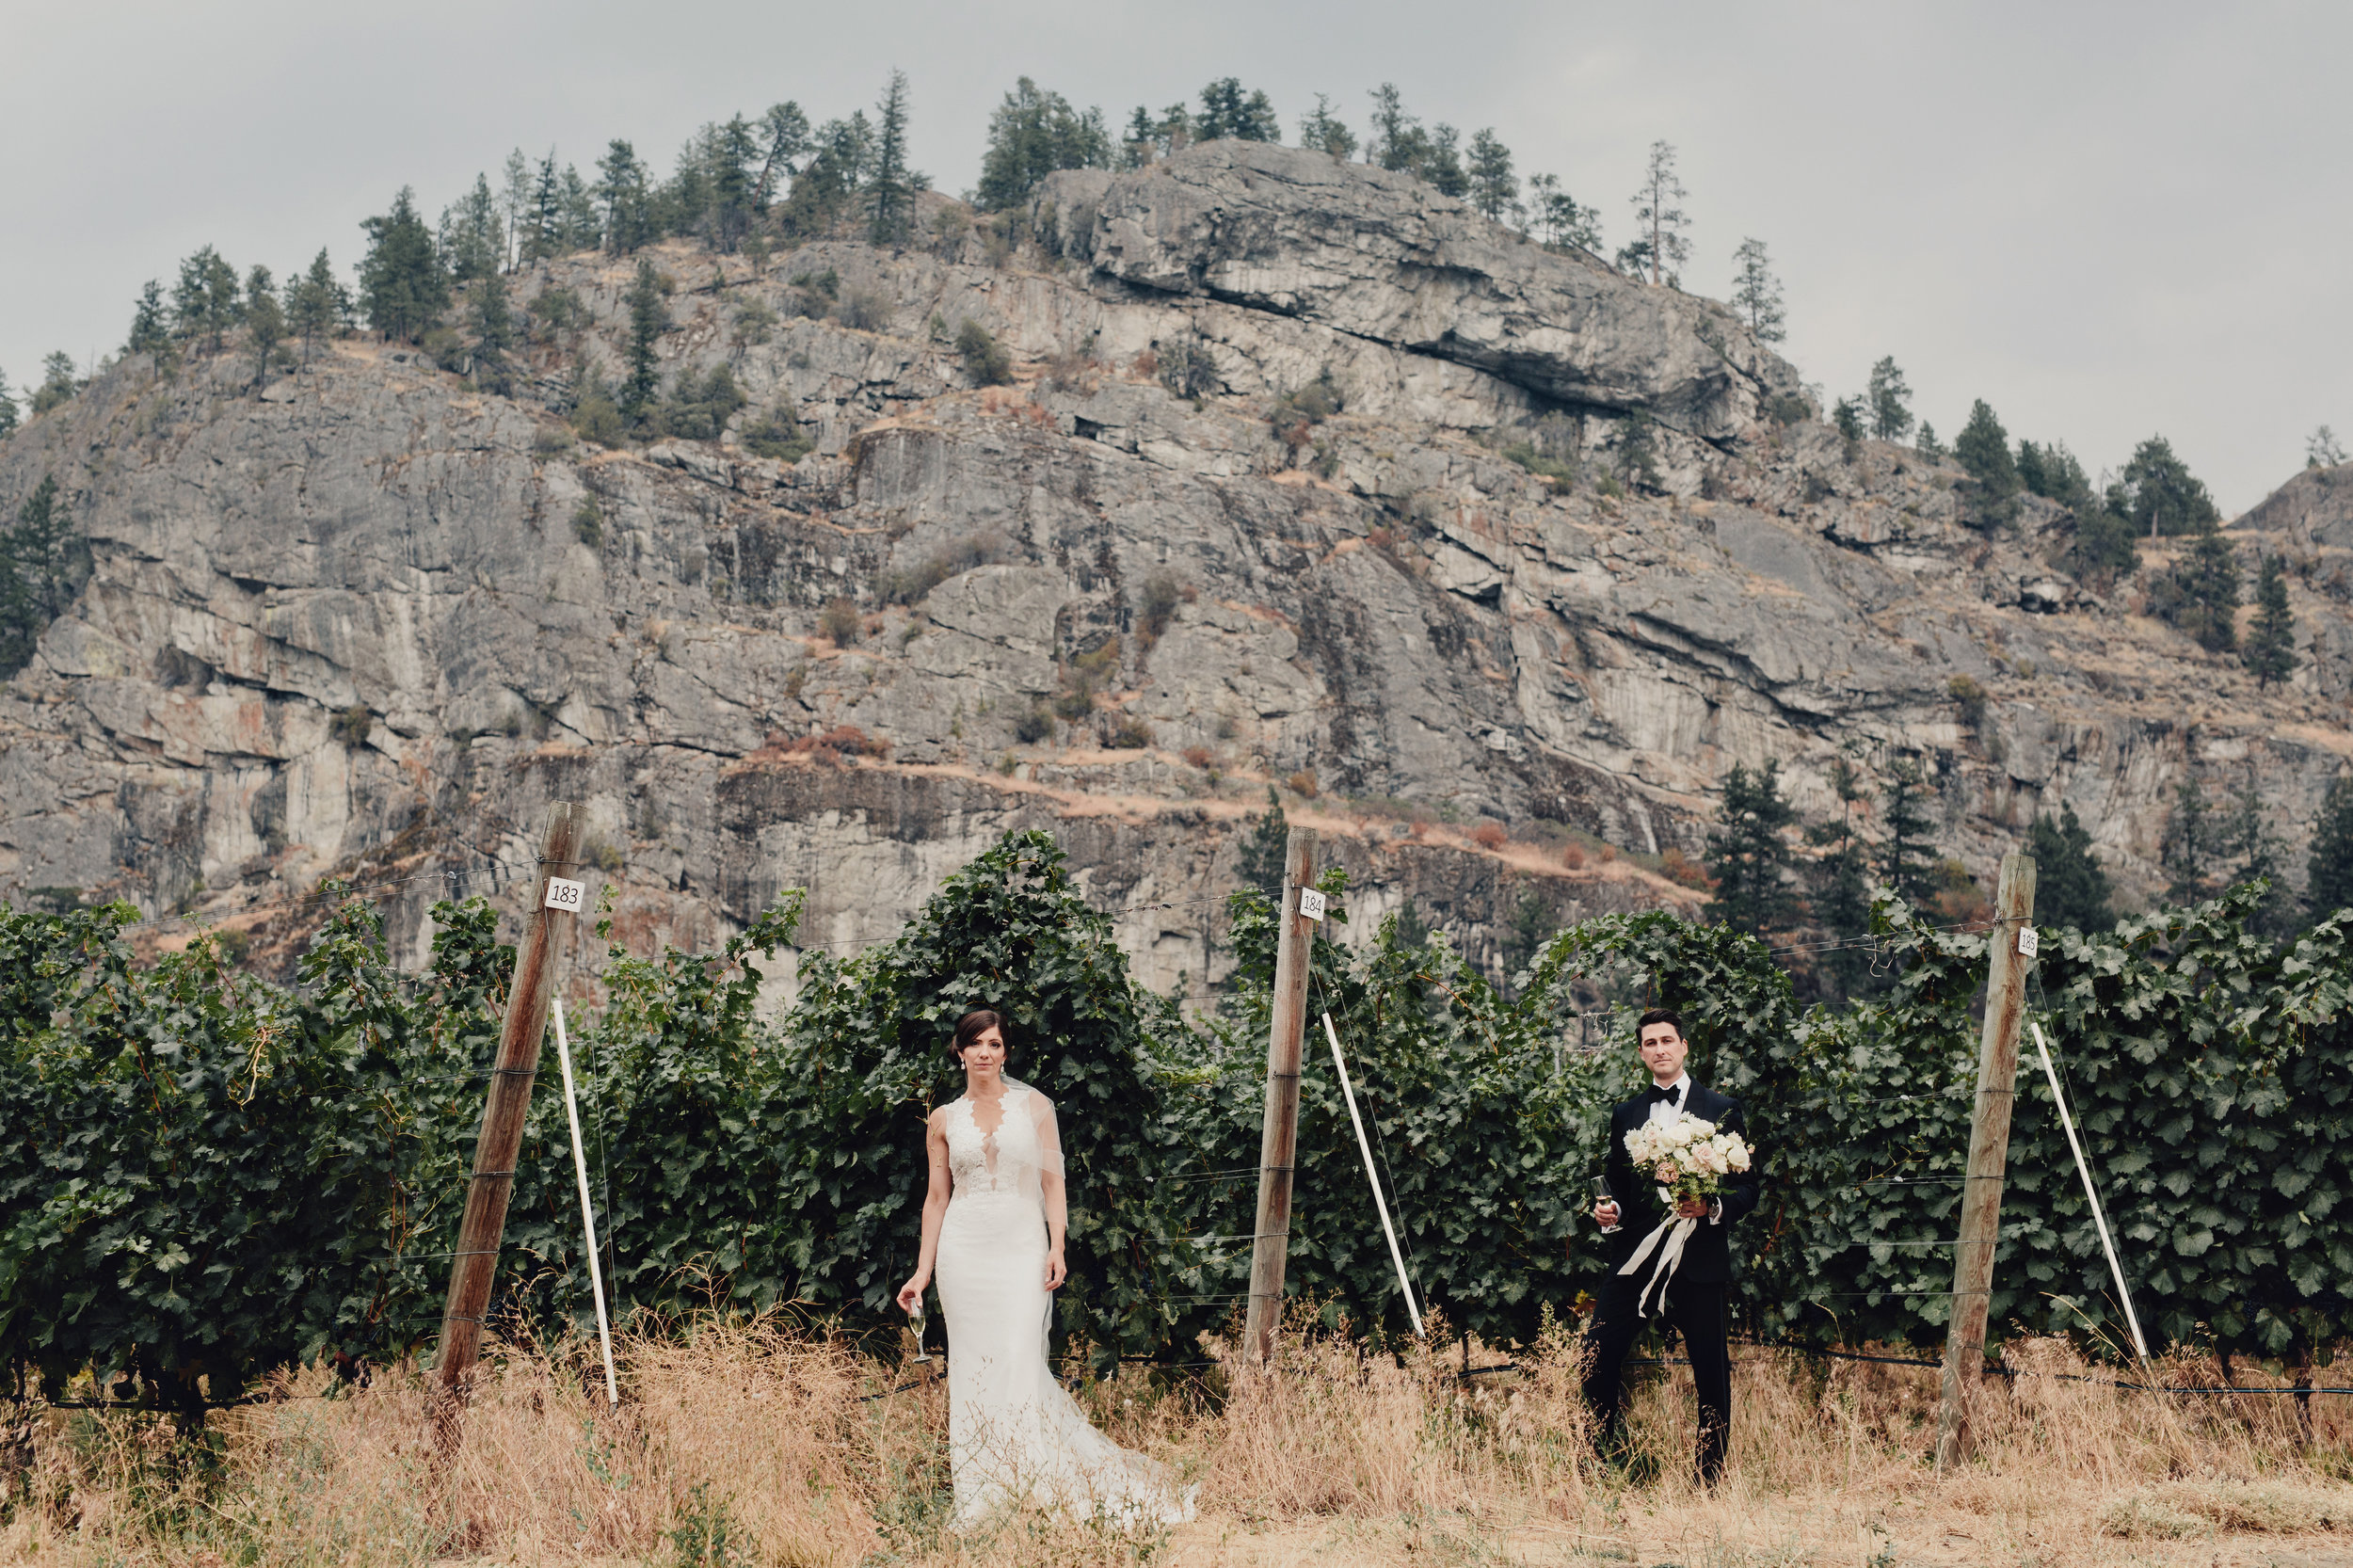 taylor-roades-wedding-0098.JPG